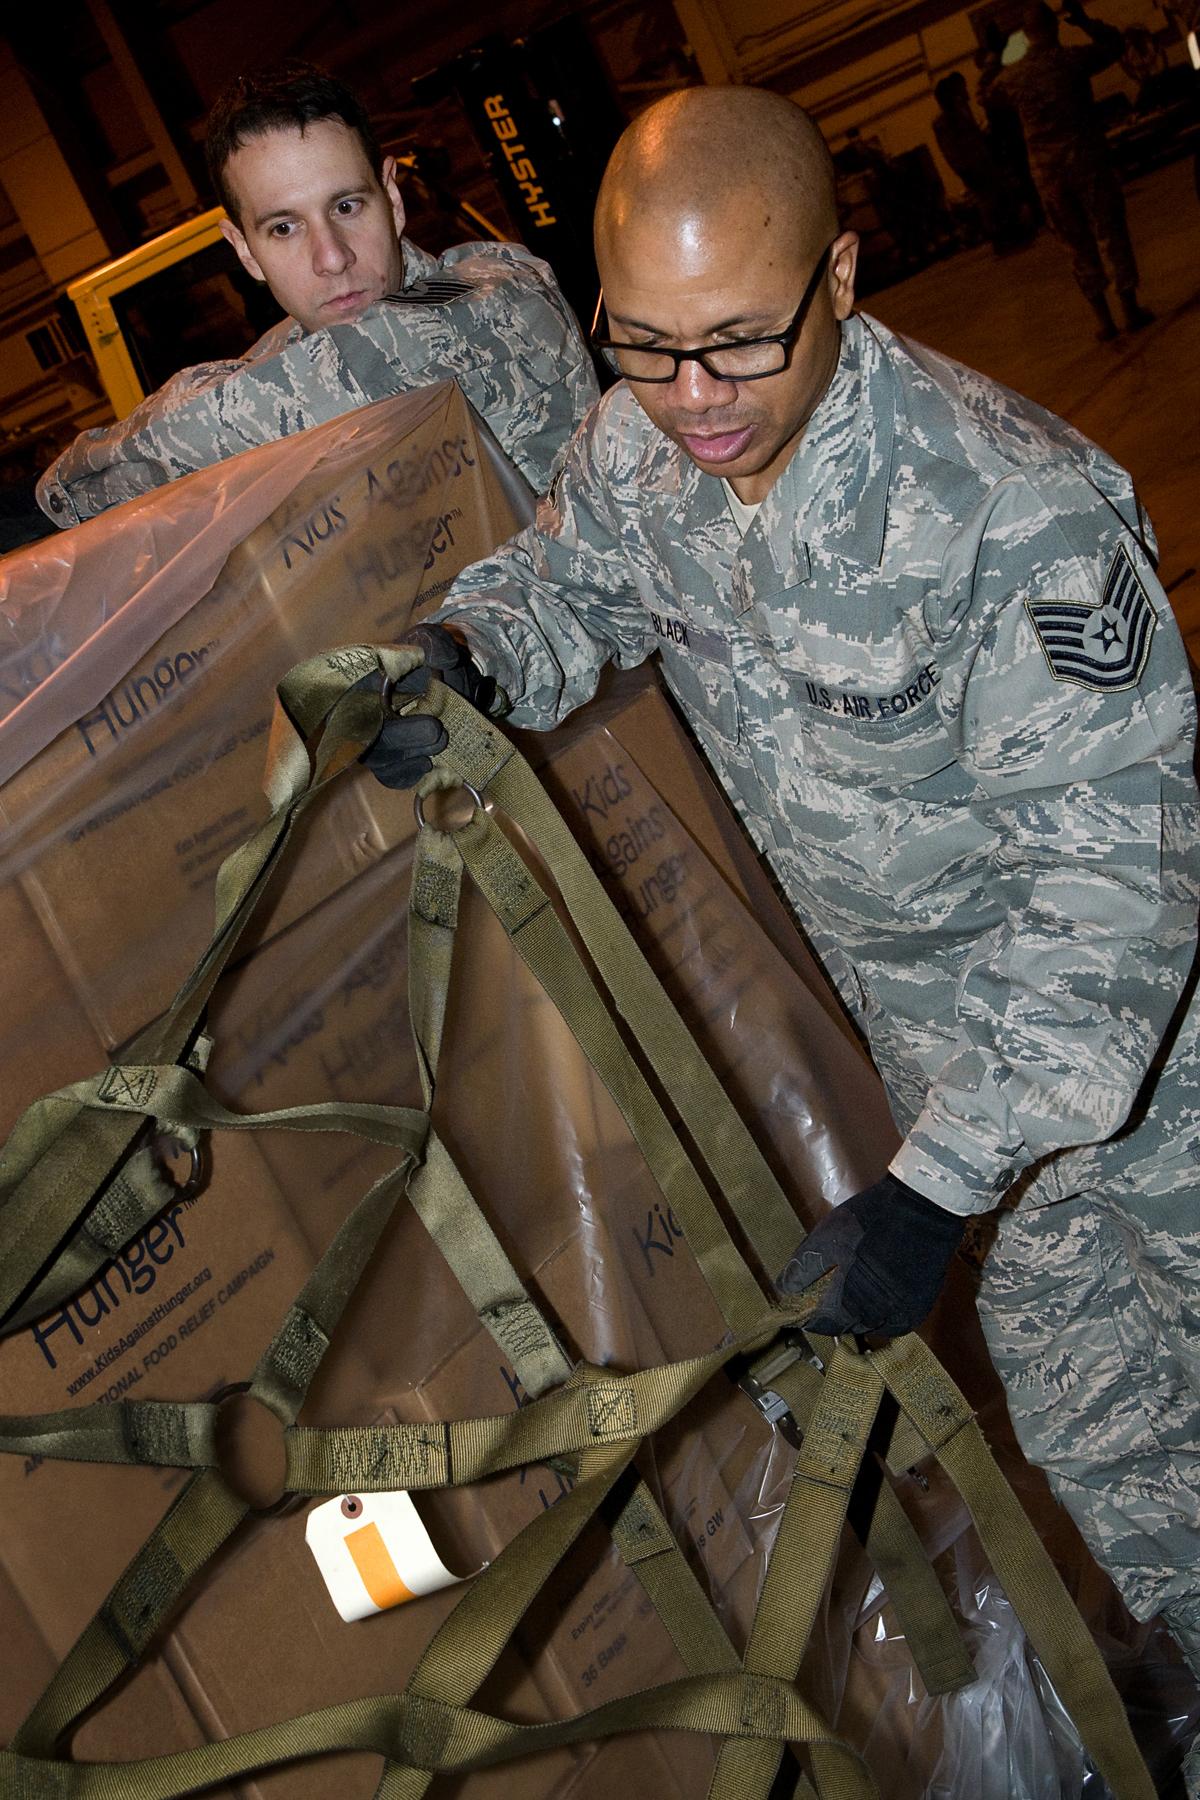 grissom afb black personals Grissom afb, ind -recently the  ideal f,3~ handheld radios, personals et2 3li,'e gree'l captjsaiai black __ 6$0 s cap738ba __  air force base.